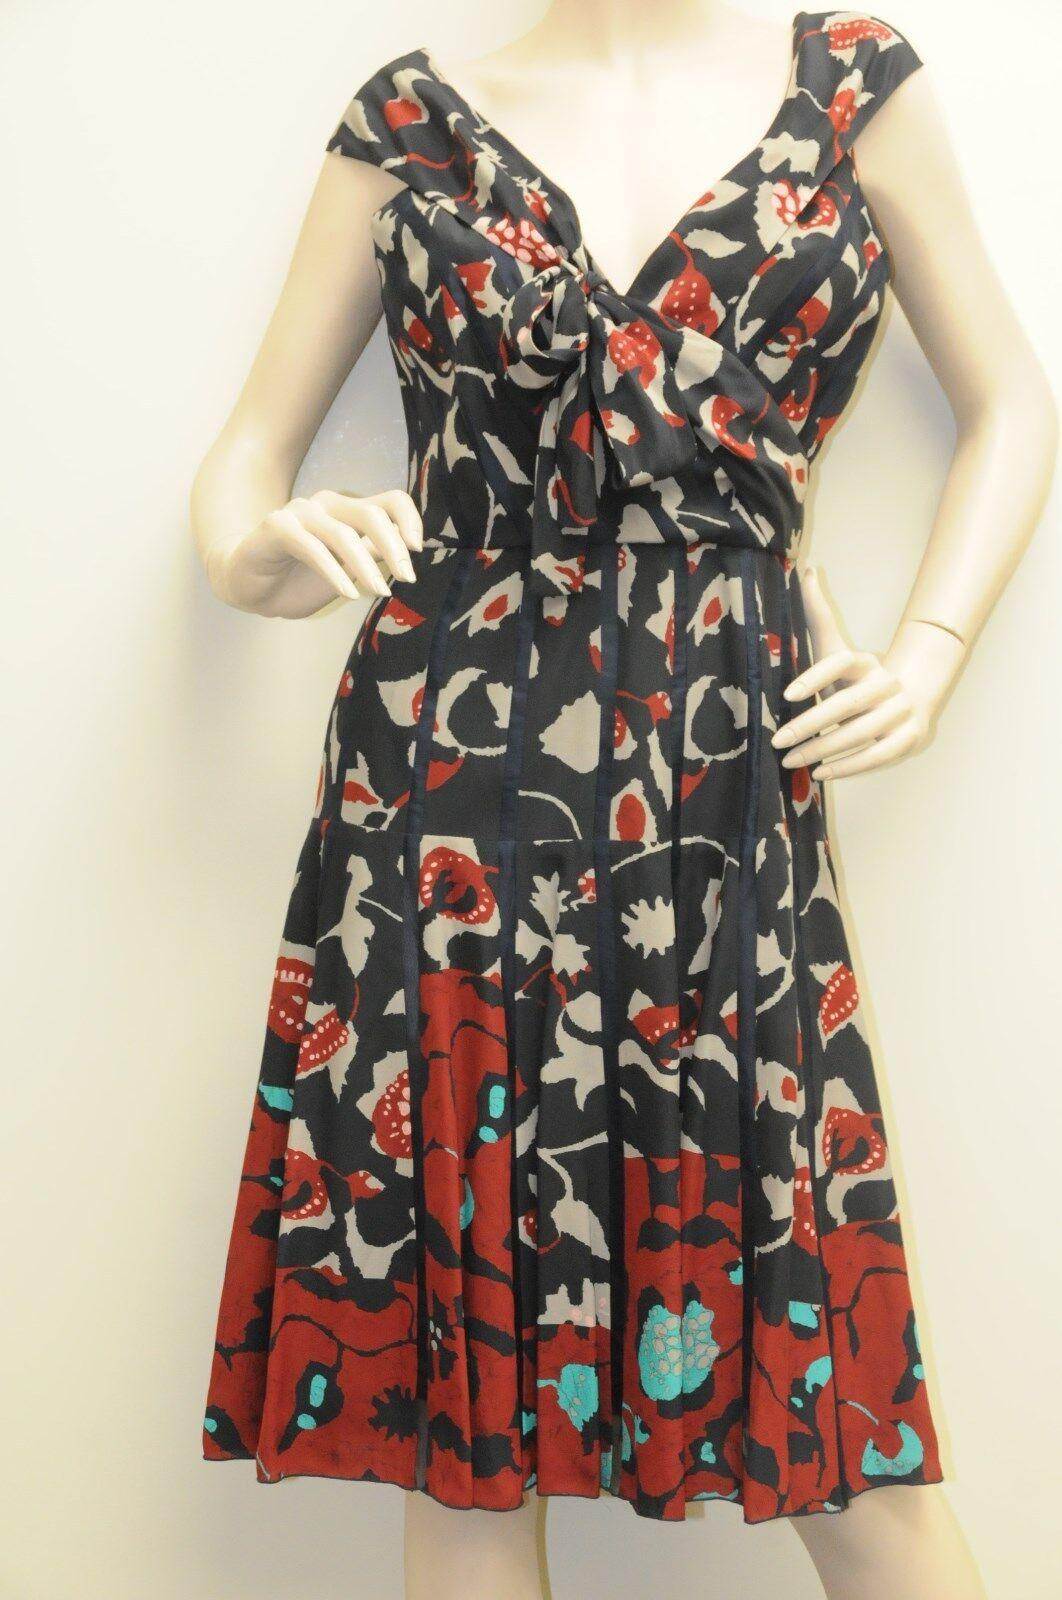 c560fd9d222f56 Neu Oscar De La Renta Batikdruck Blaumenmuster Seidenschleife R12 Kleid  Kleid Kleid 6 95006c